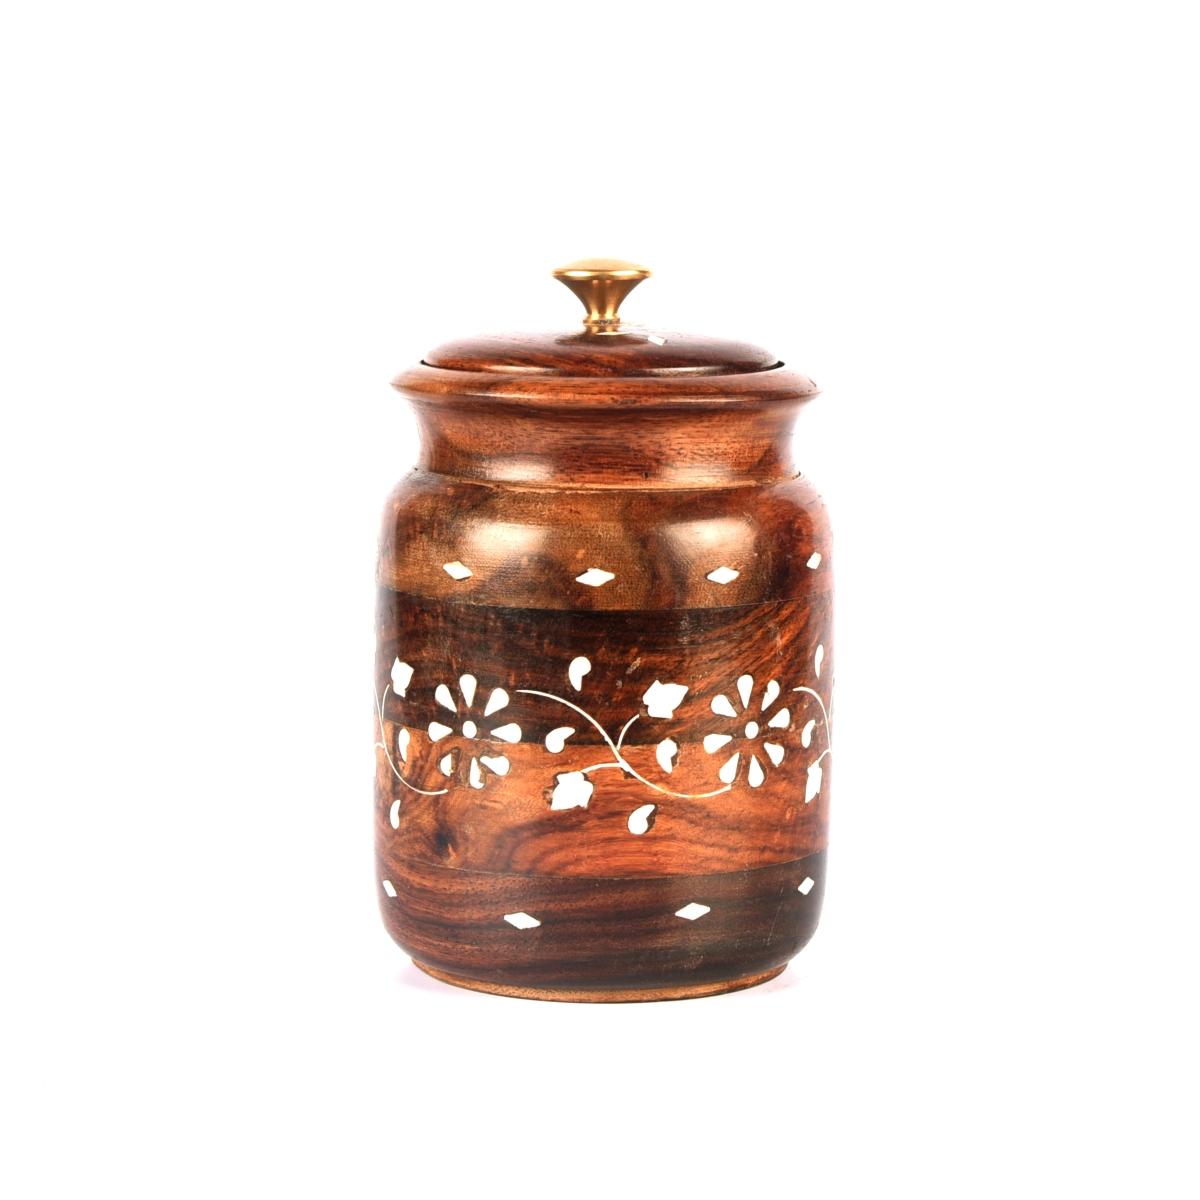 wooden salt container